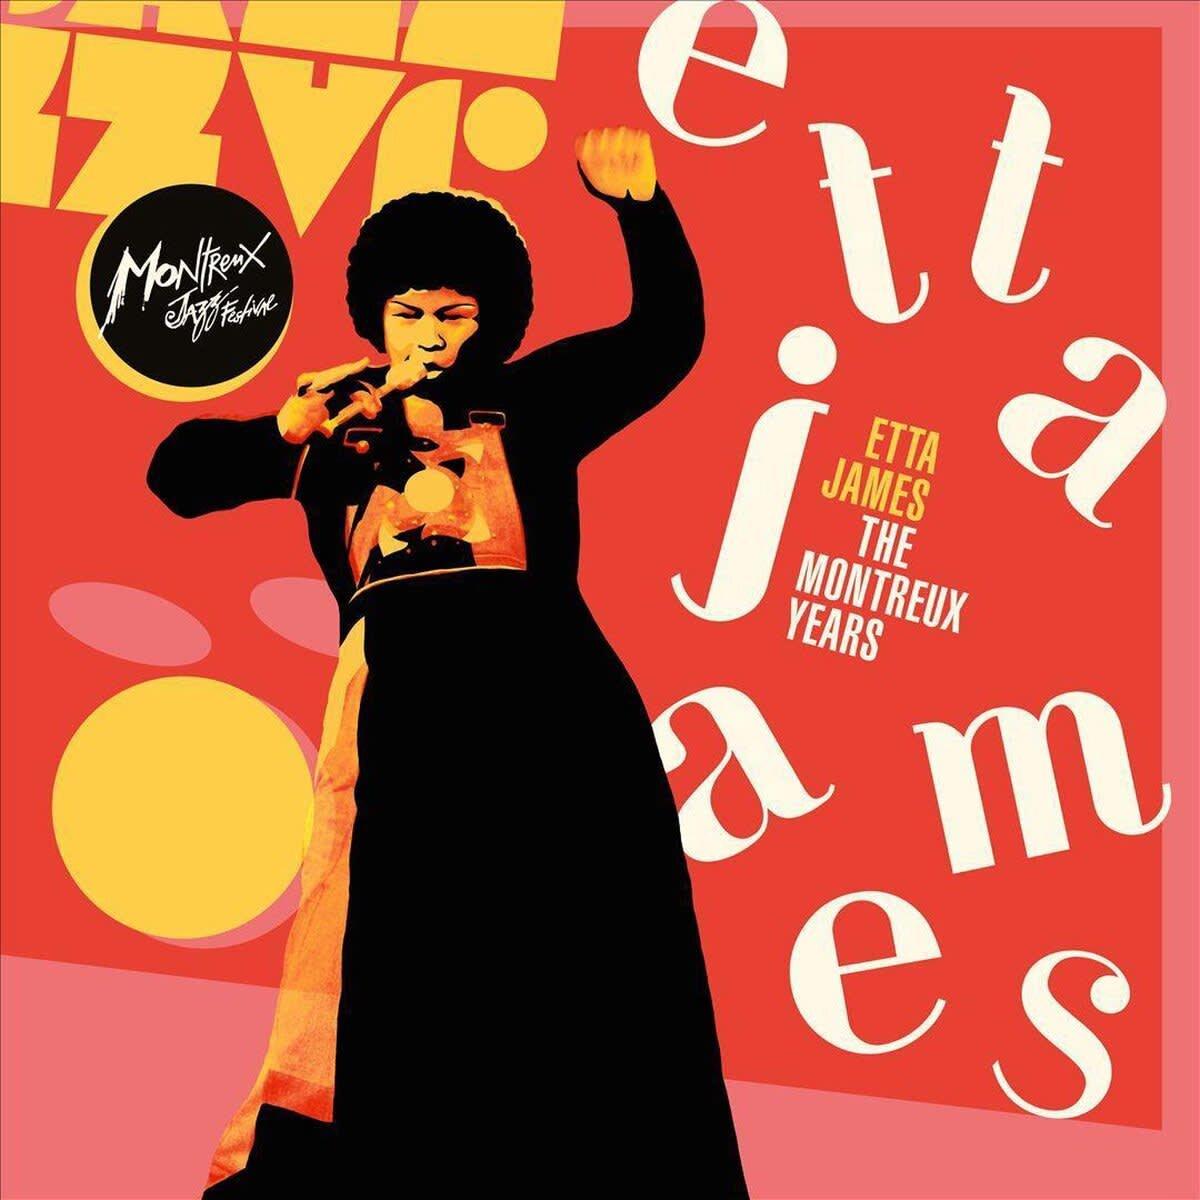 Etta James - The Montreux Years album